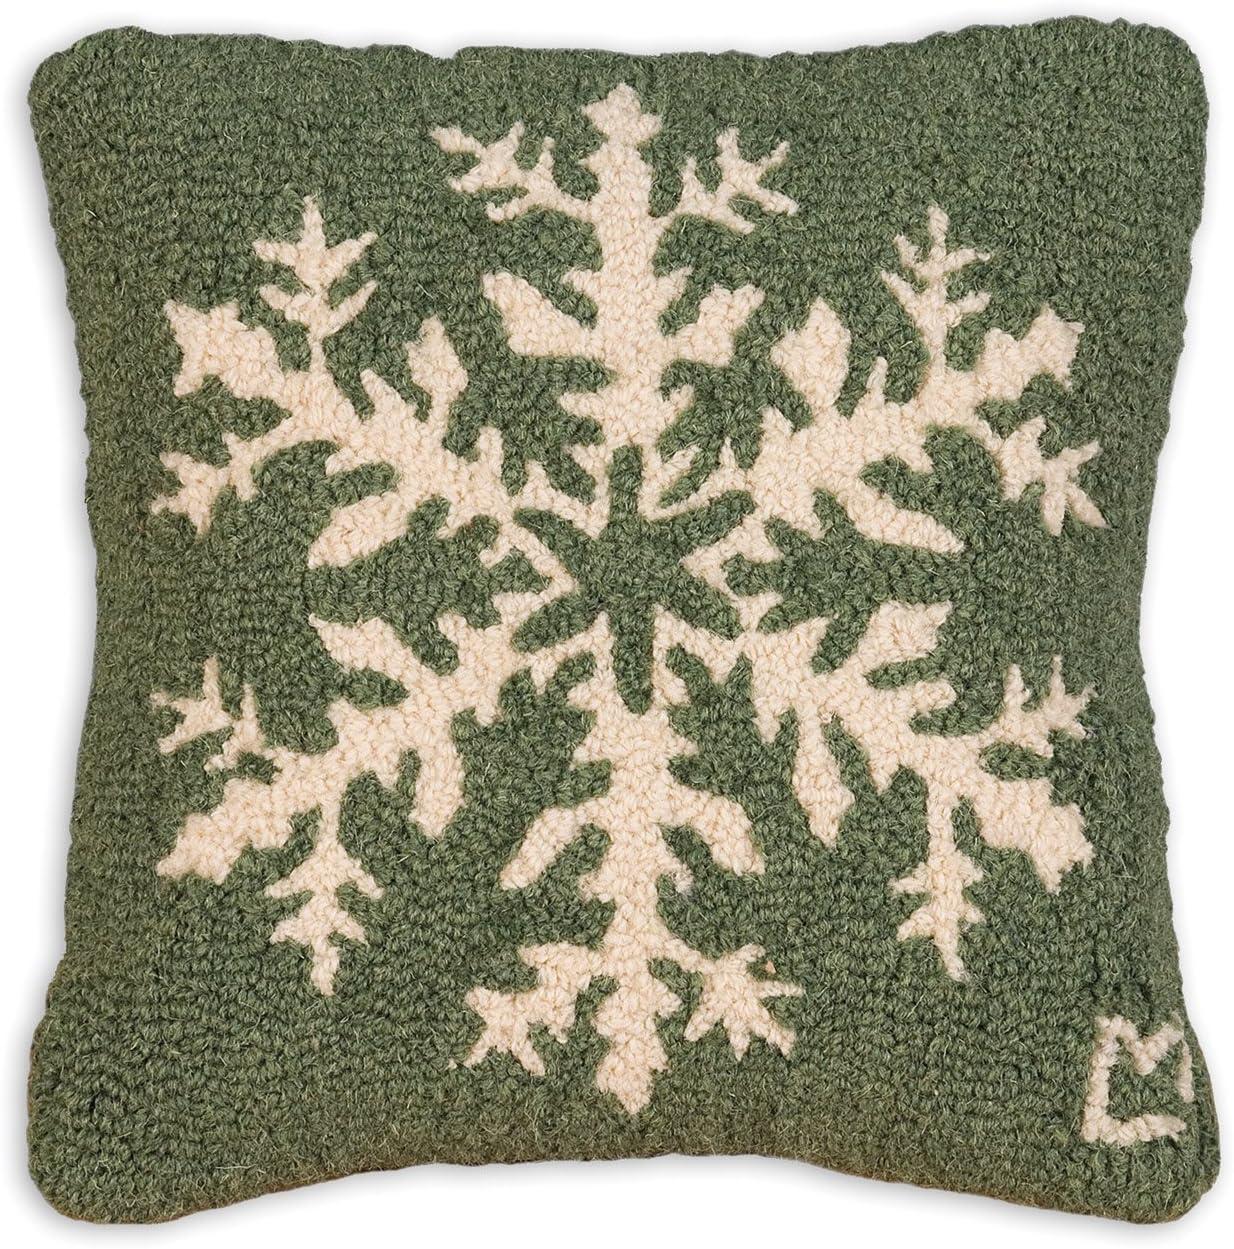 Chandler 4 Corners Artist-Designed Pine Snowflake Hand-Hooked Wool Decorative Throw Pillow 14 x 14